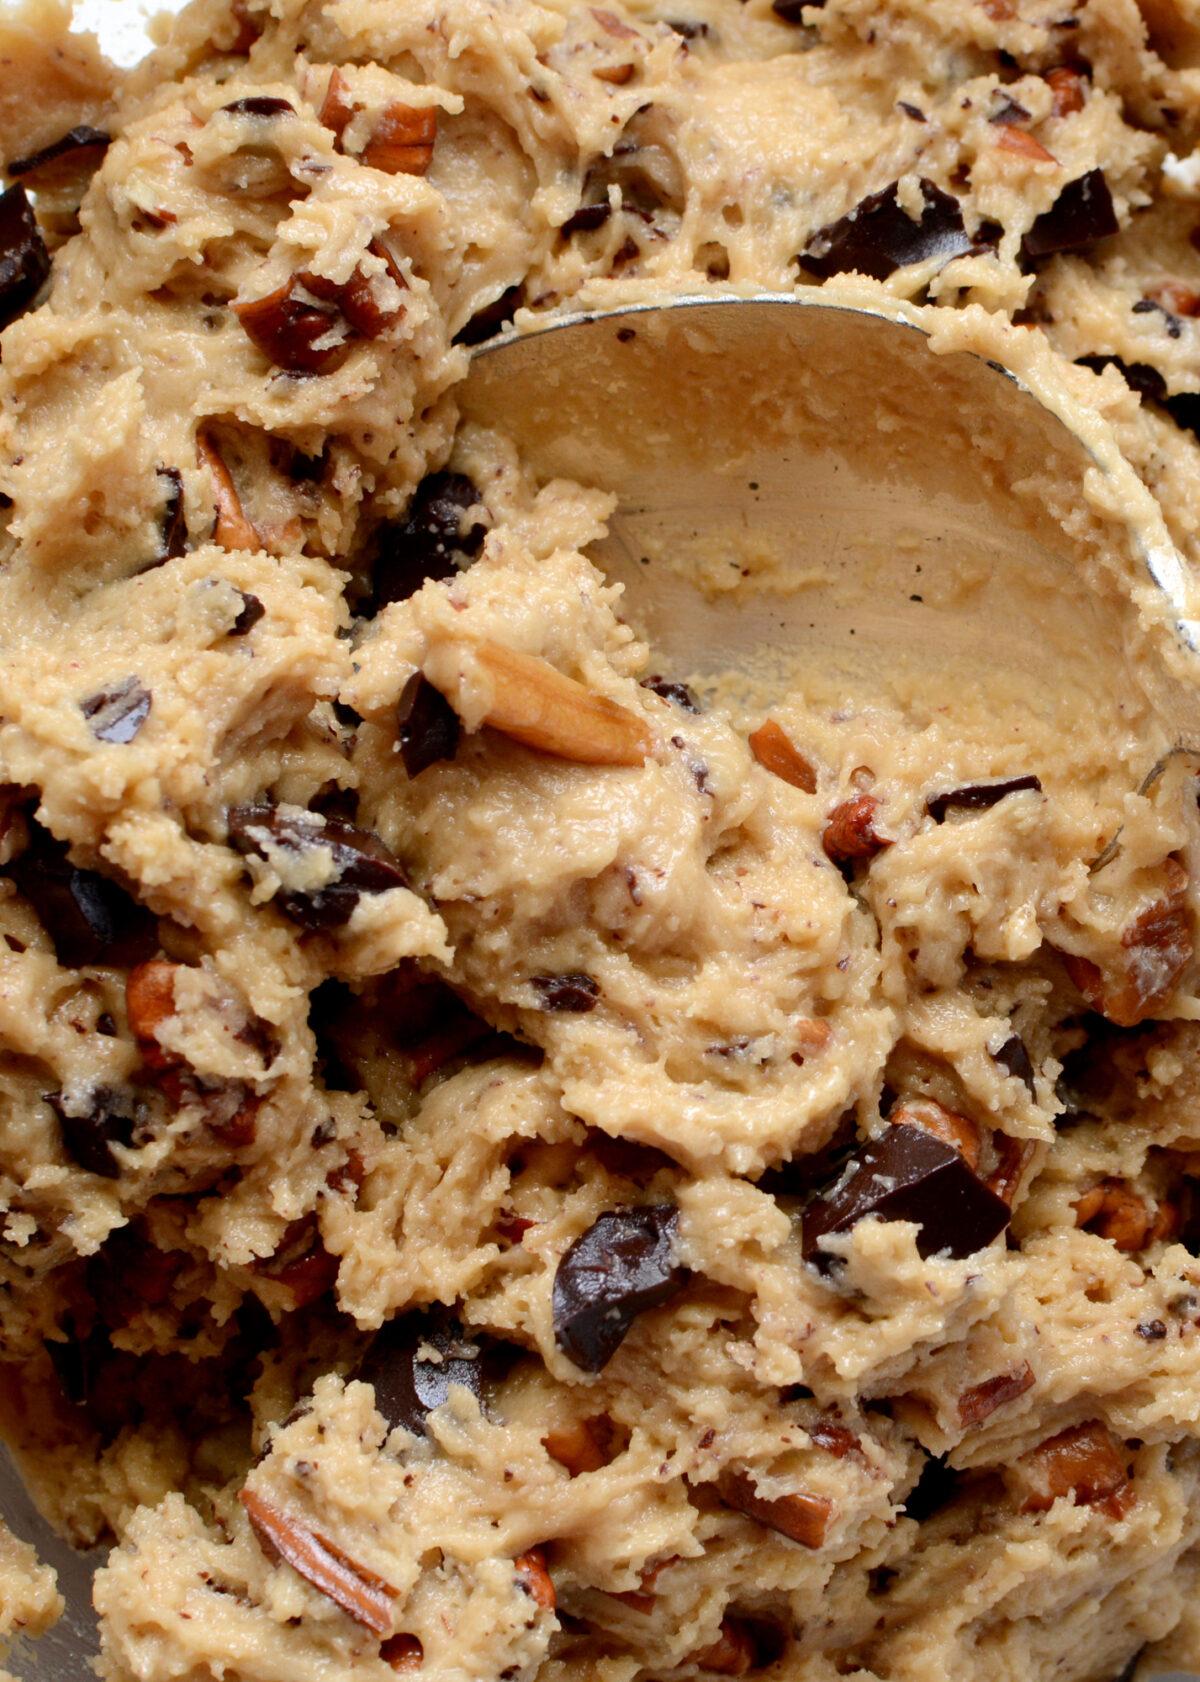 Chocolate Pecan Cookies, cookie dough ready